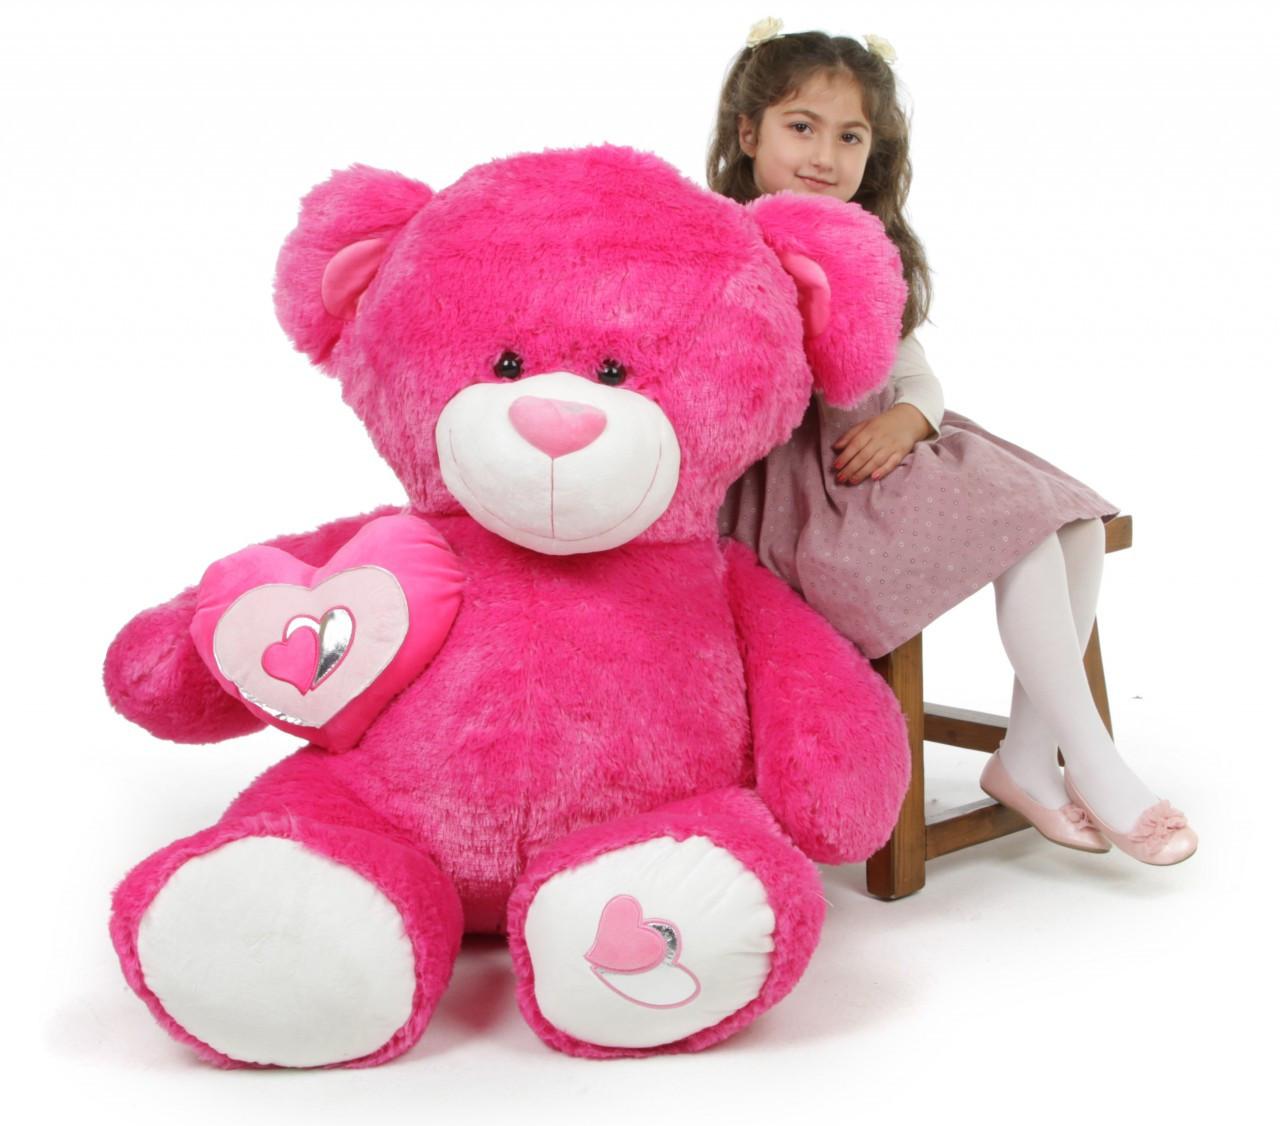 f9f83210ec1 ChaCha Big Love Irresistible Huge Hot Pink Teddy Bear 47 in - Giant ...